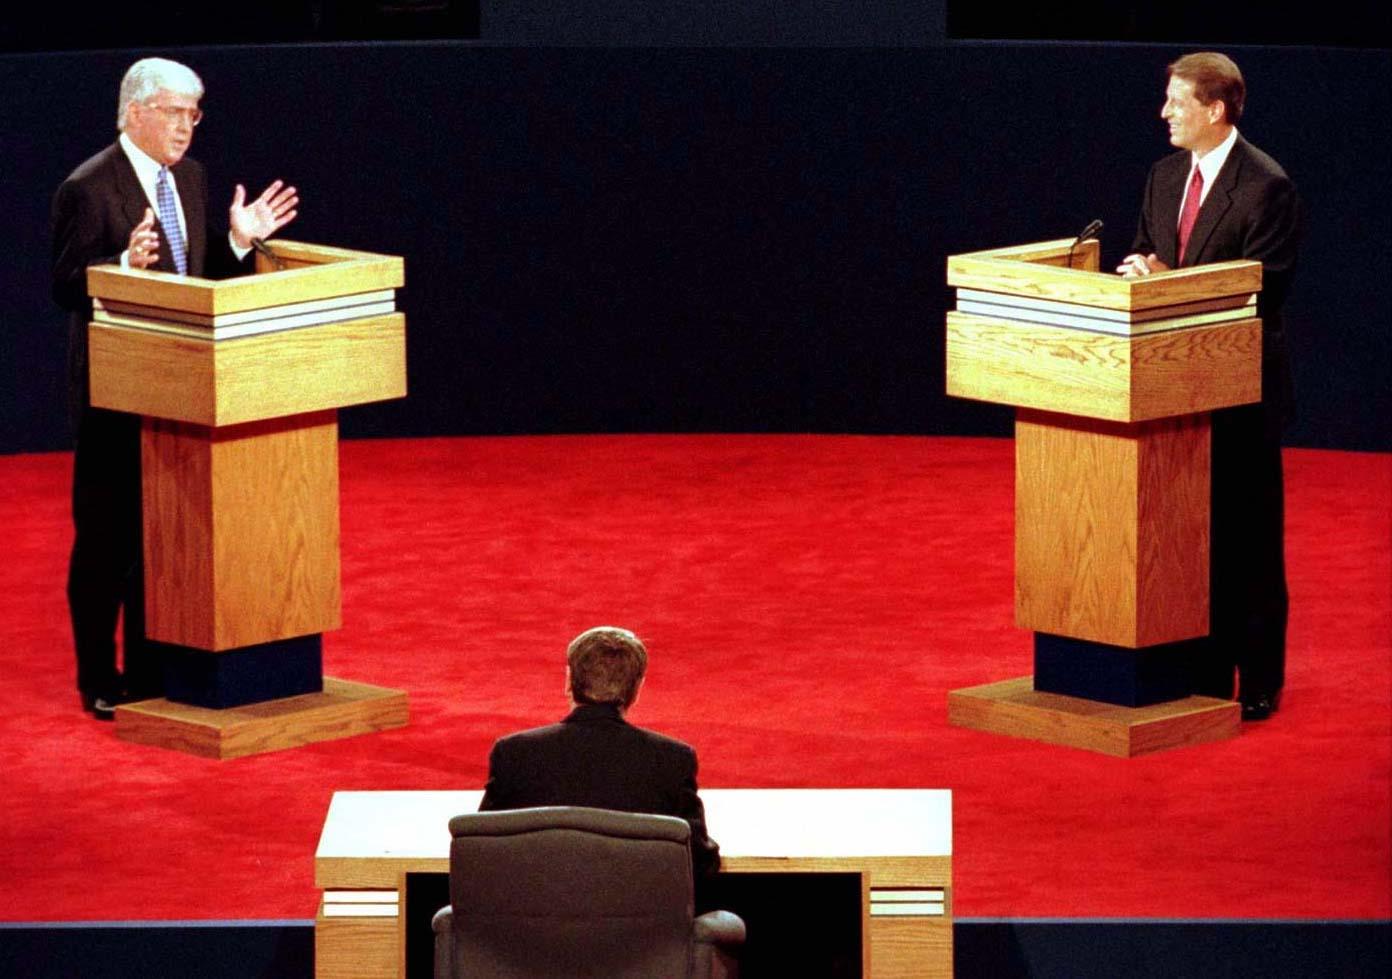 Gore vs. Kemp: The 1996 vice presidential debate